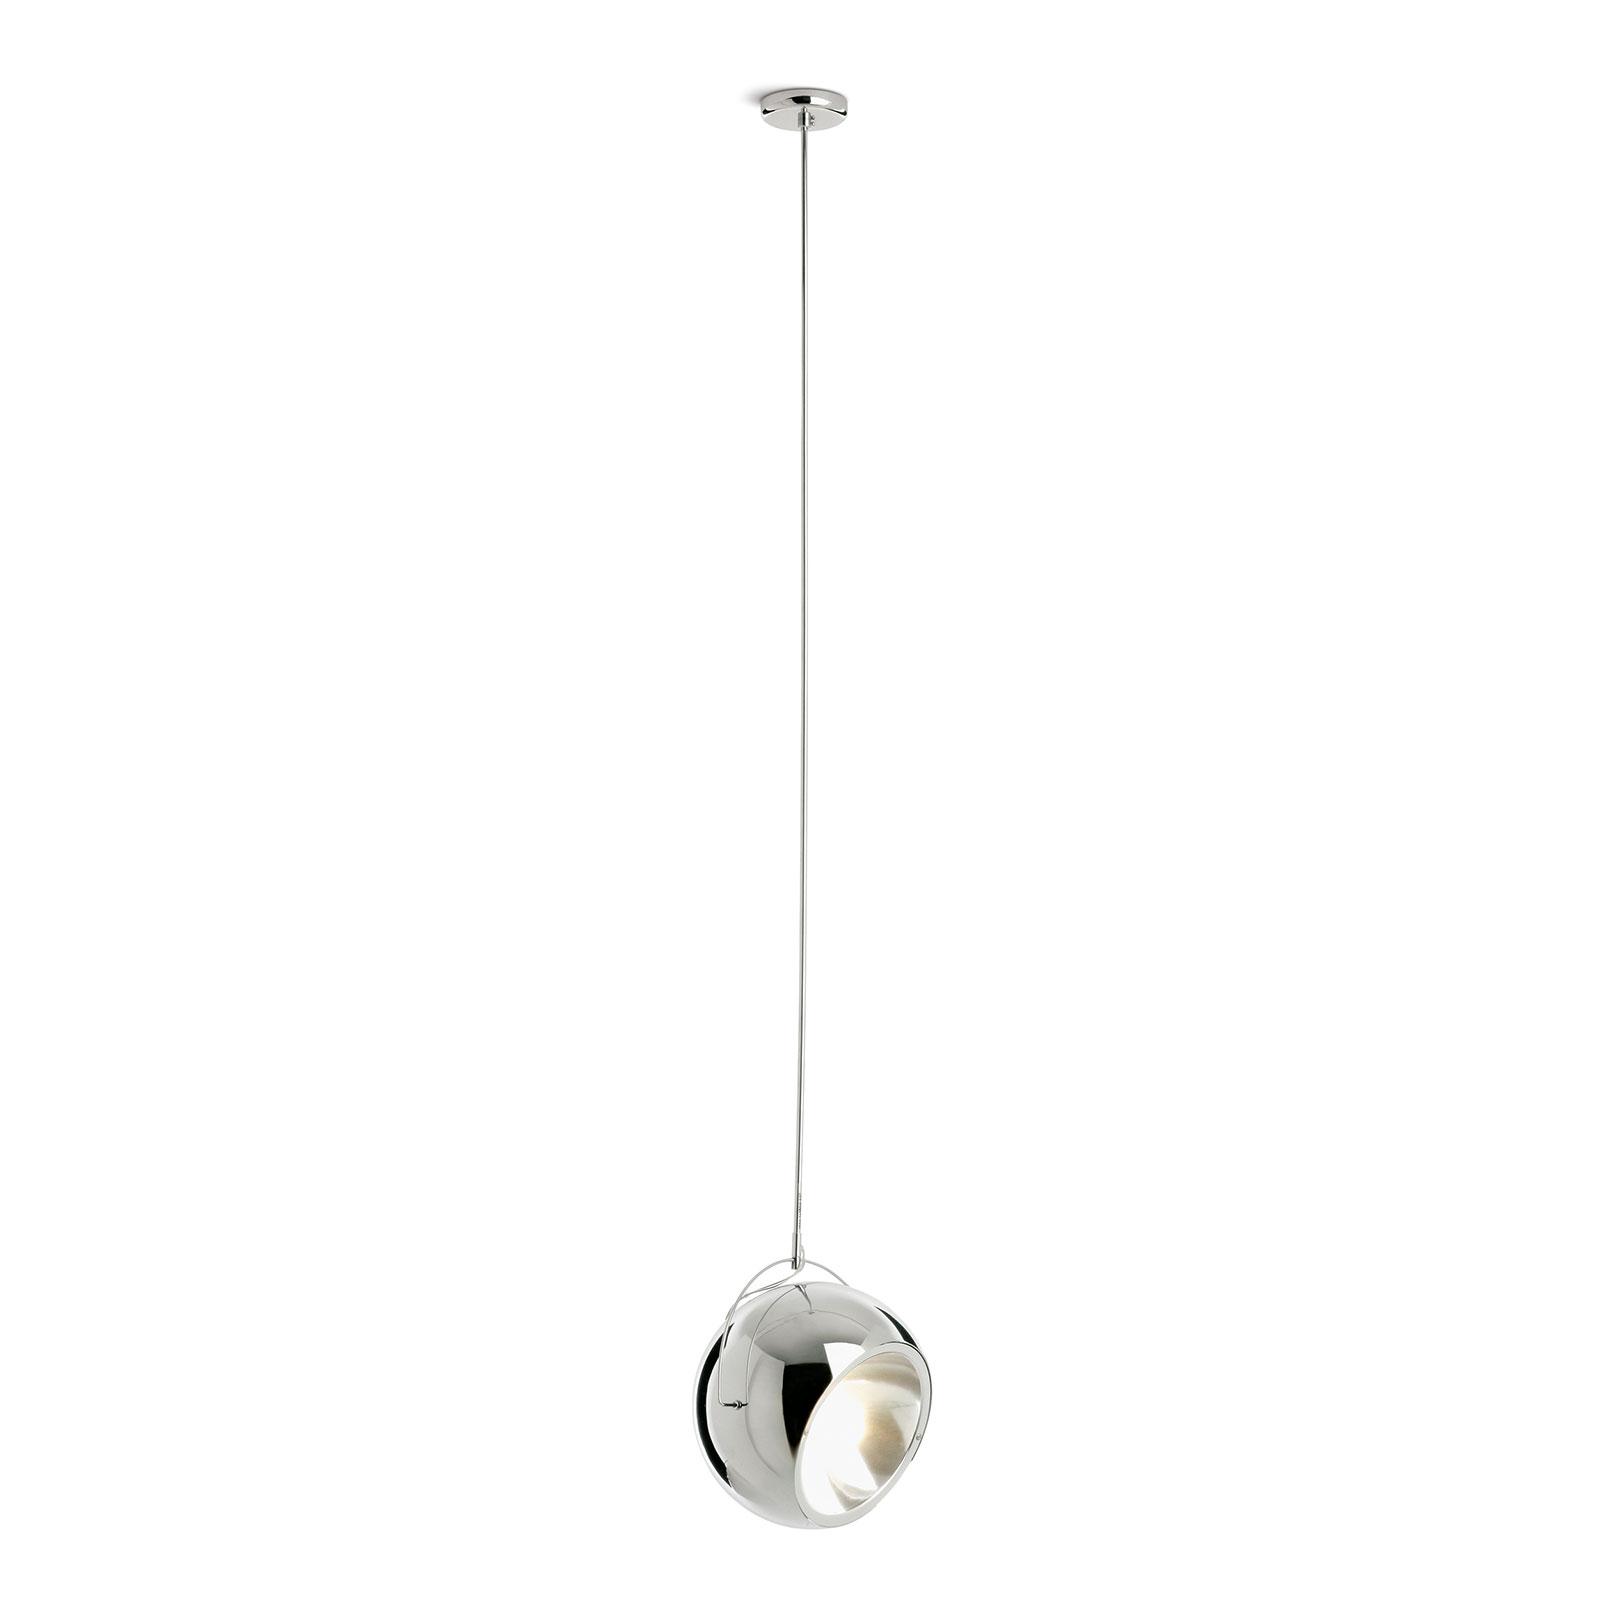 Fabbian Beluga Steel Chrom-Hängeleuchte, Ø 20 cm